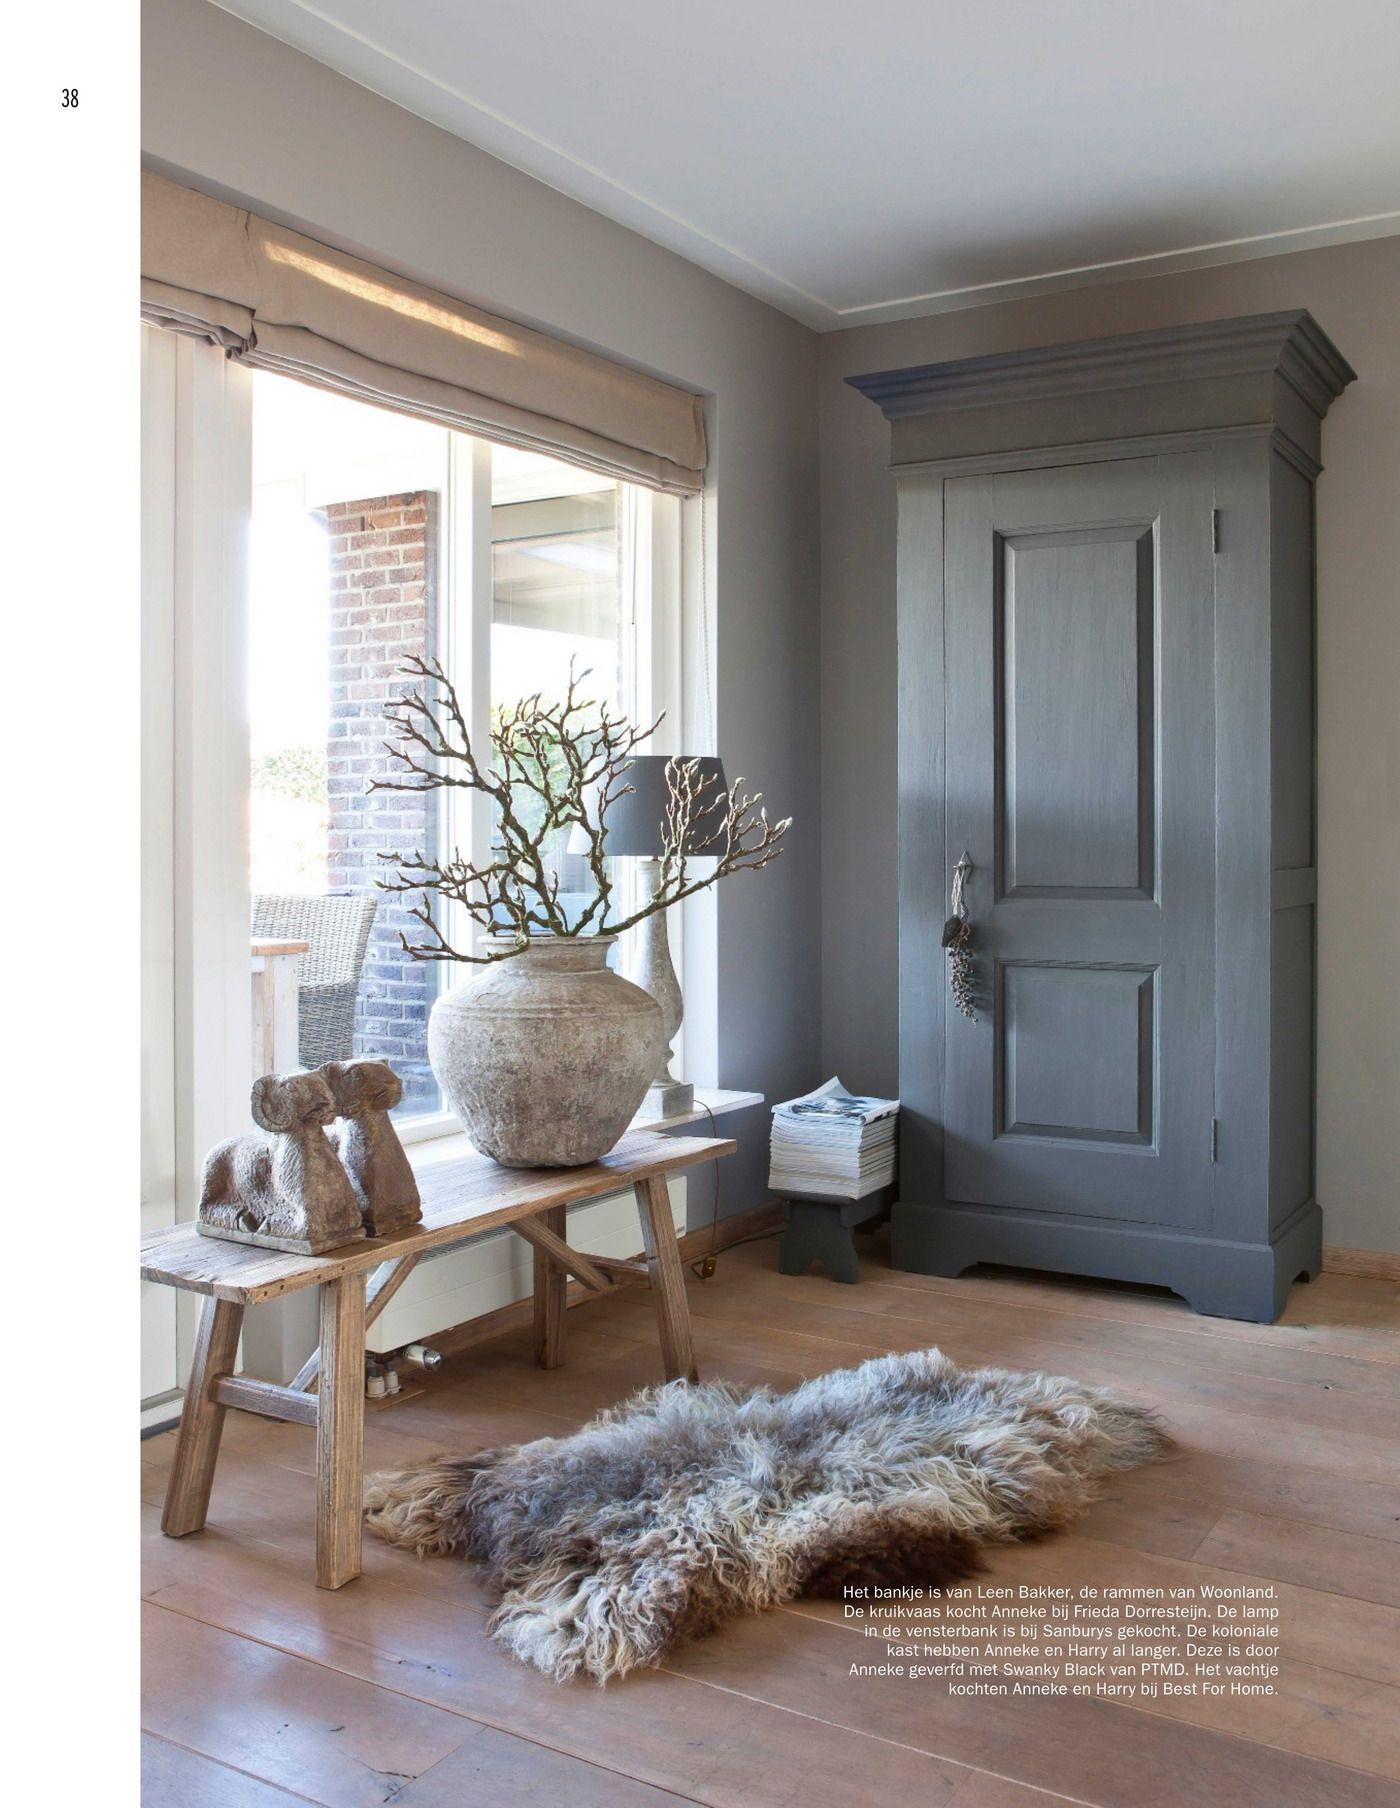 Wonen landelijke stijl vtwonen designbeurs huis for Franse stijl interieur